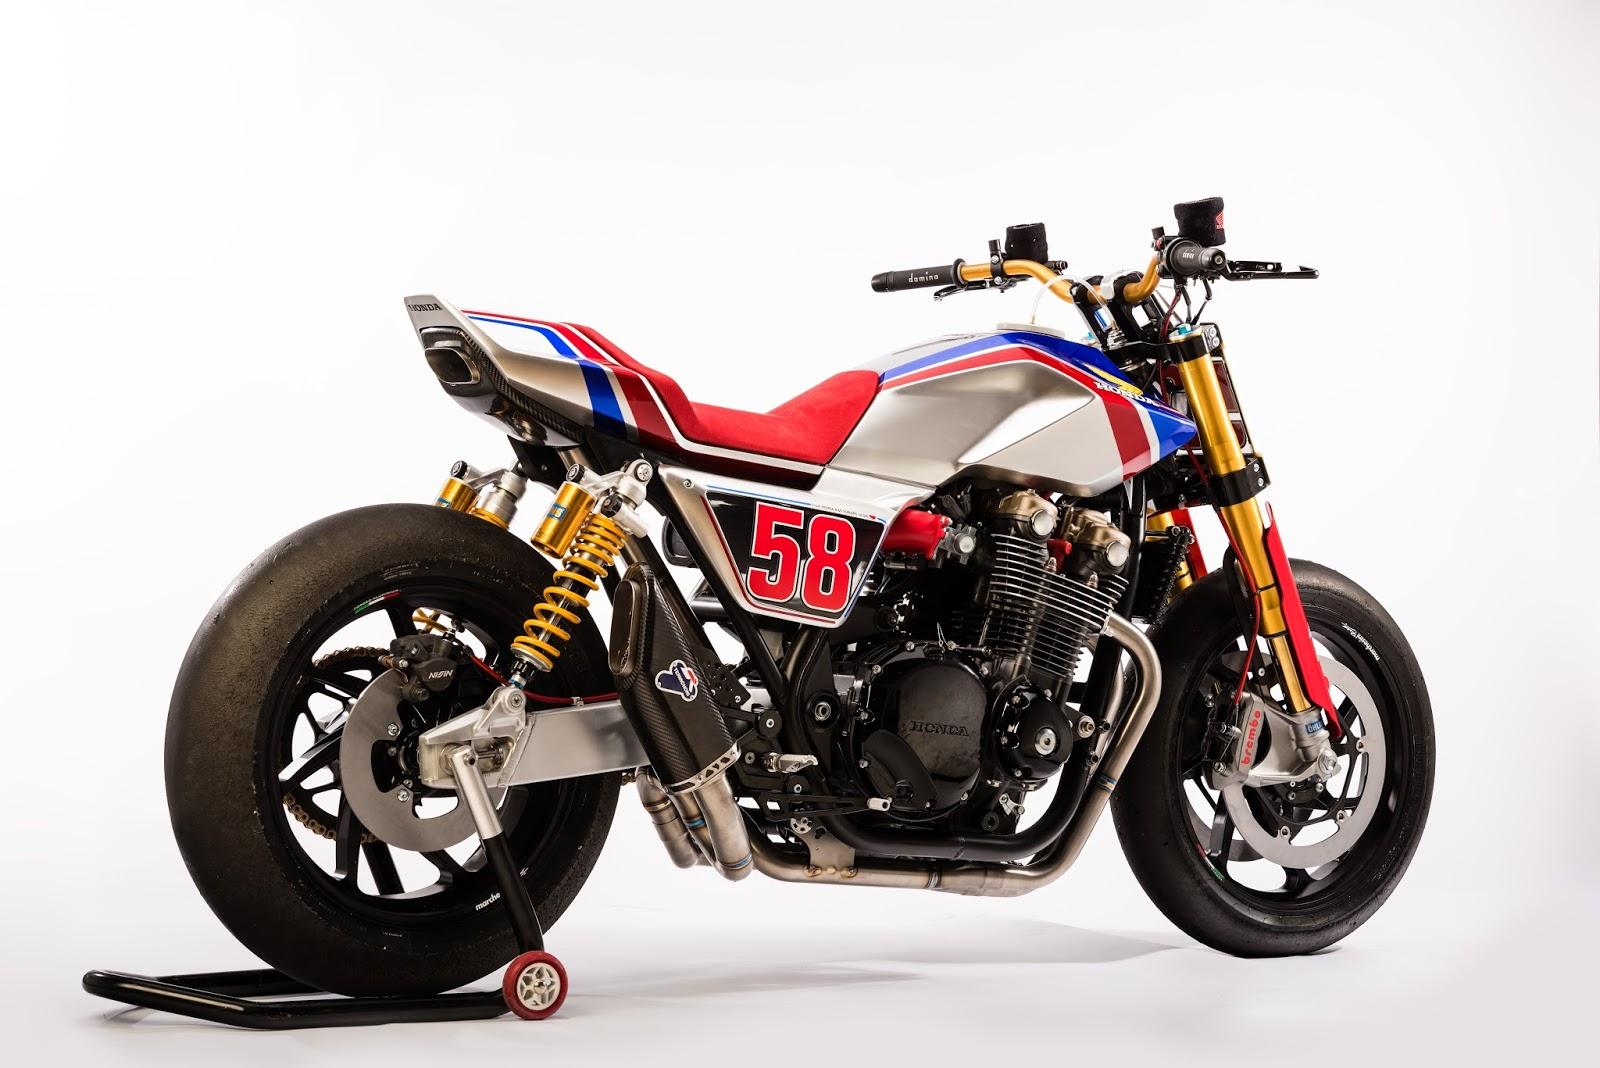 Honda CB 1100 TR  Honda%2BCB1100%2BTR%2BConcept%2B-007